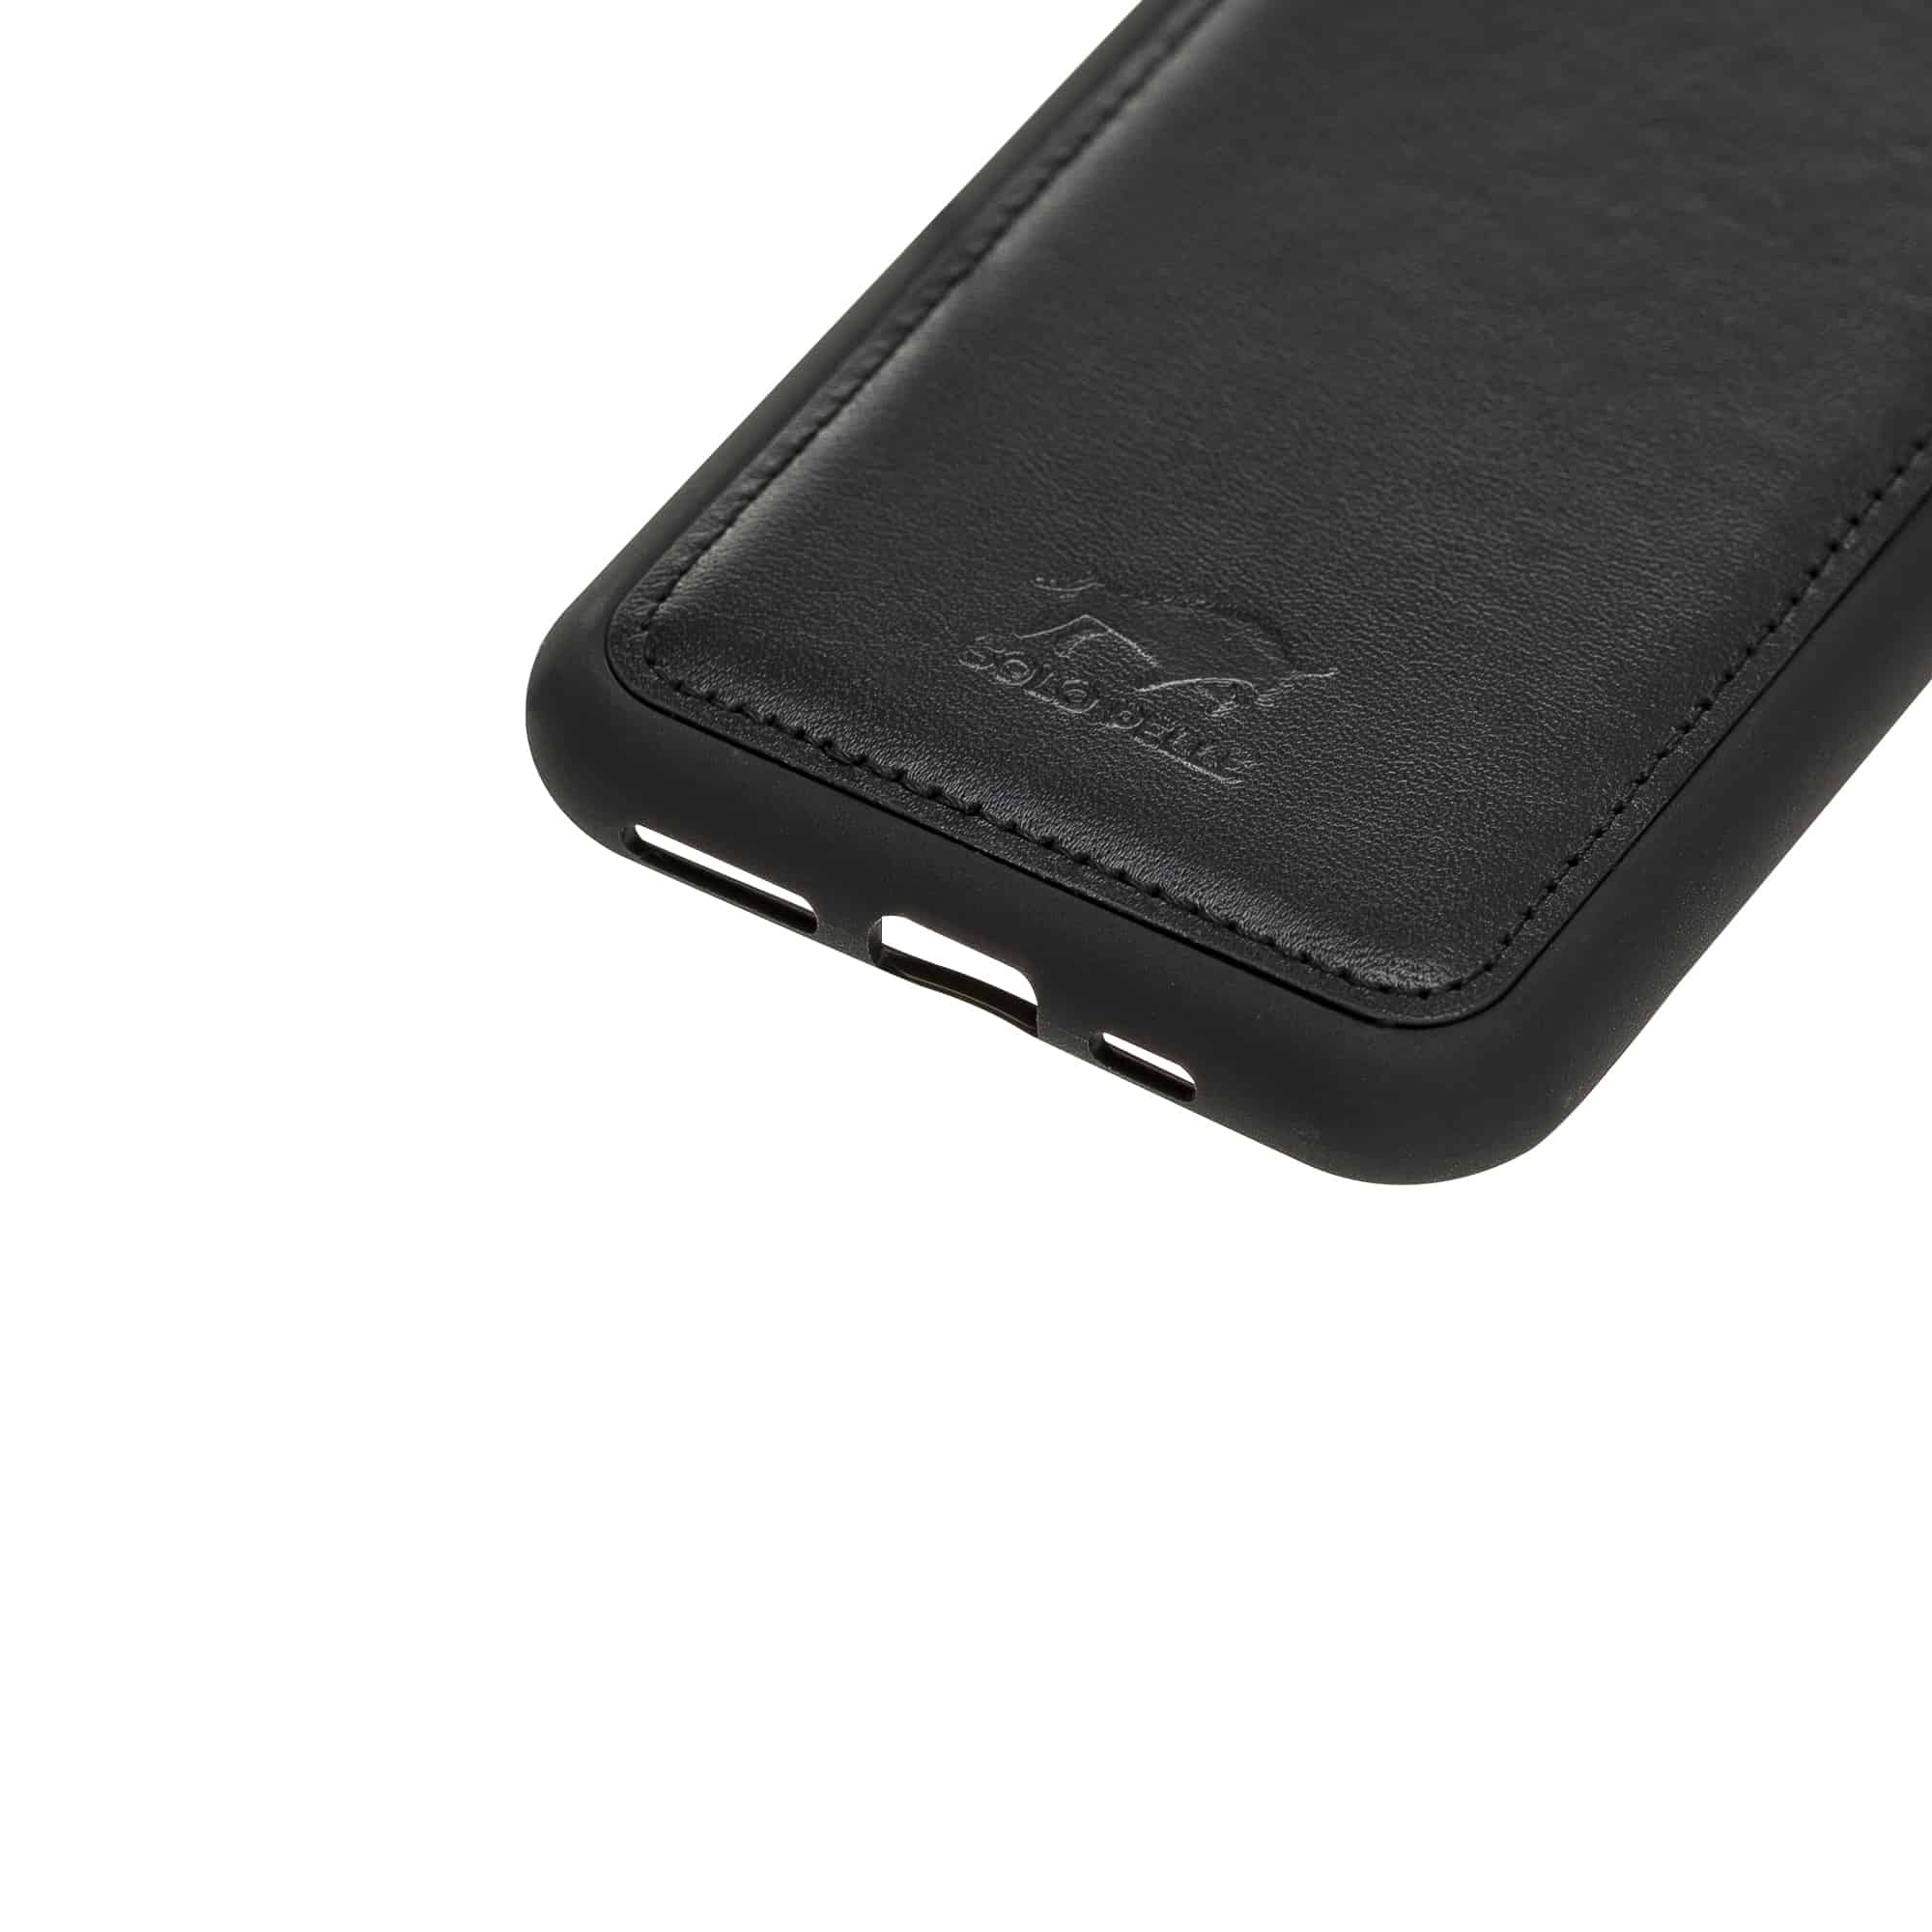 Solo Pelle Lederhülle für das iPhone 11 Pro in 5.8 Zoll Stanford Case Leder Hülle Ledertasche Backcover aus echtem Leder (Schwarz)